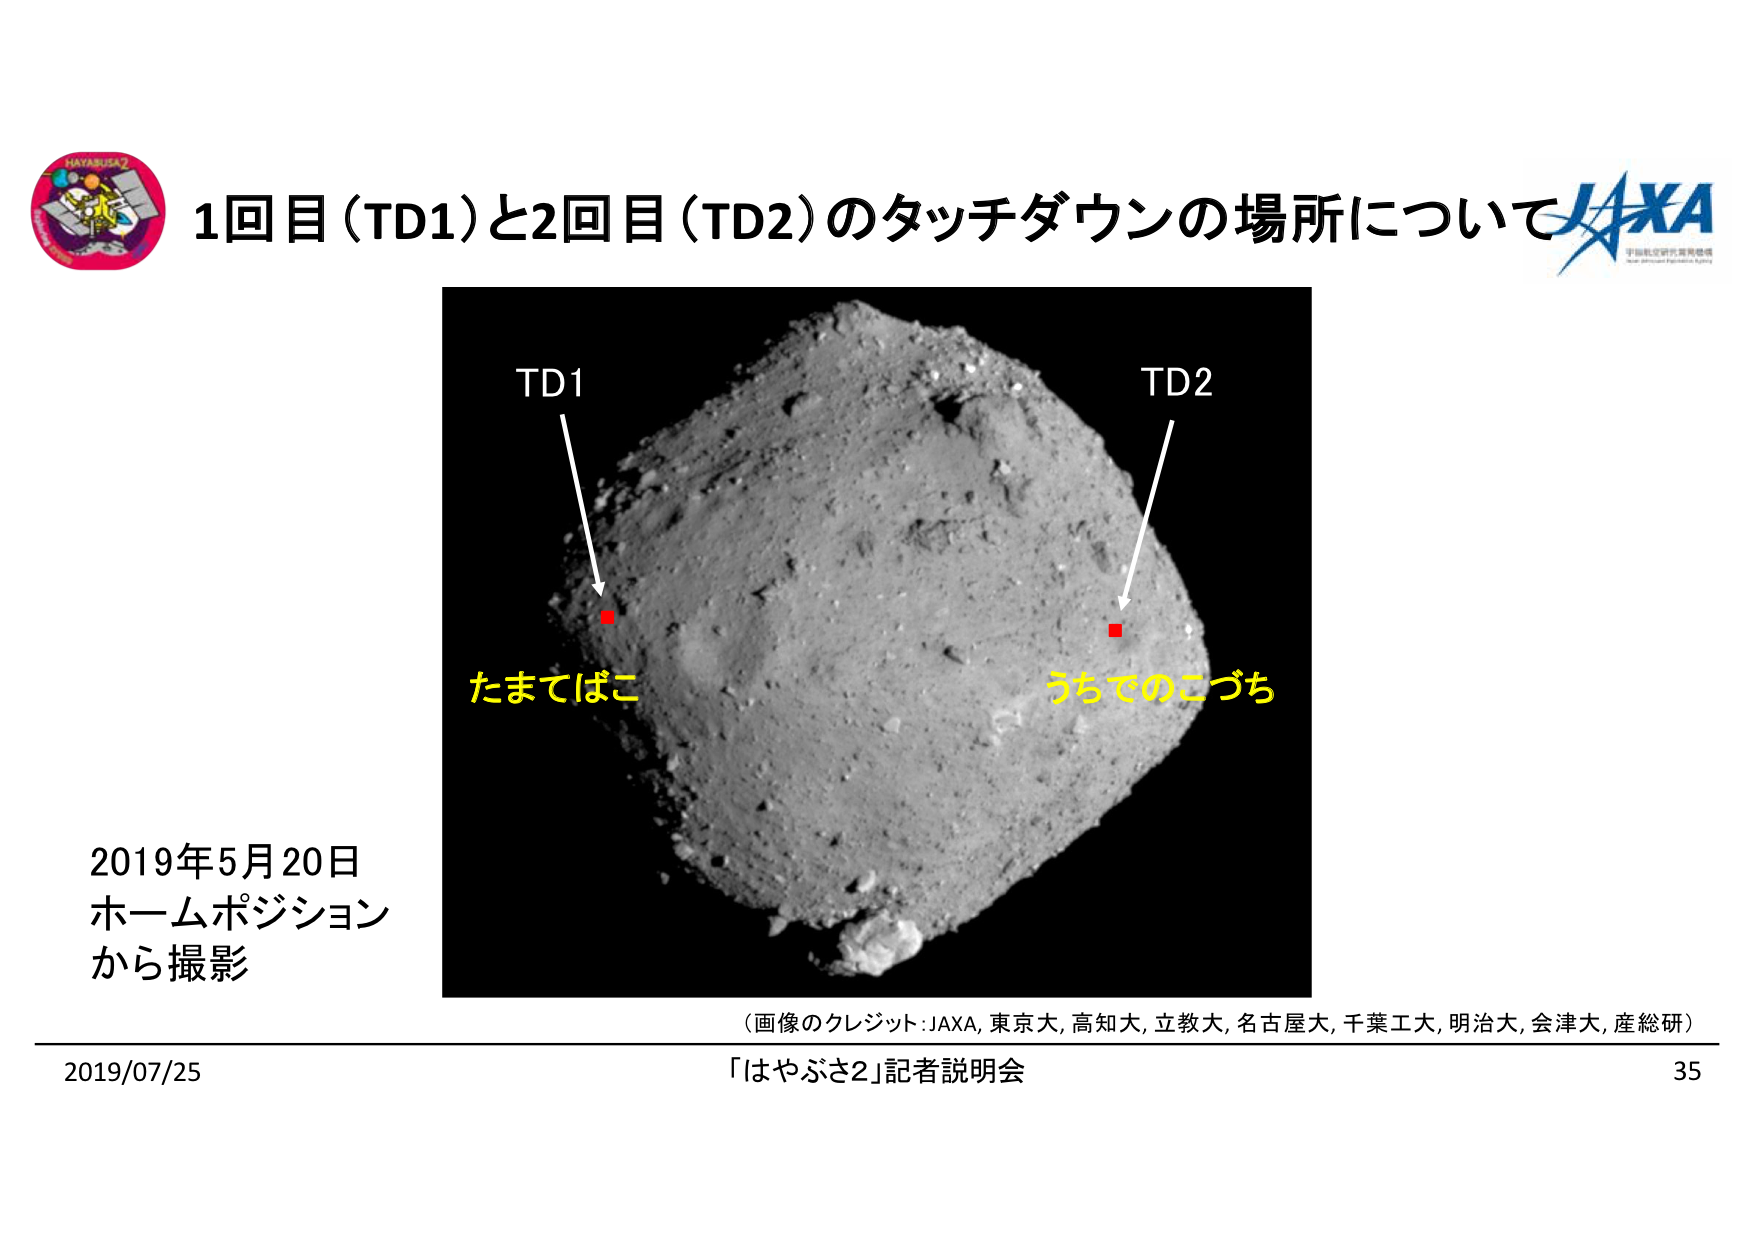 f:id:Imamura:20190725151428p:plain